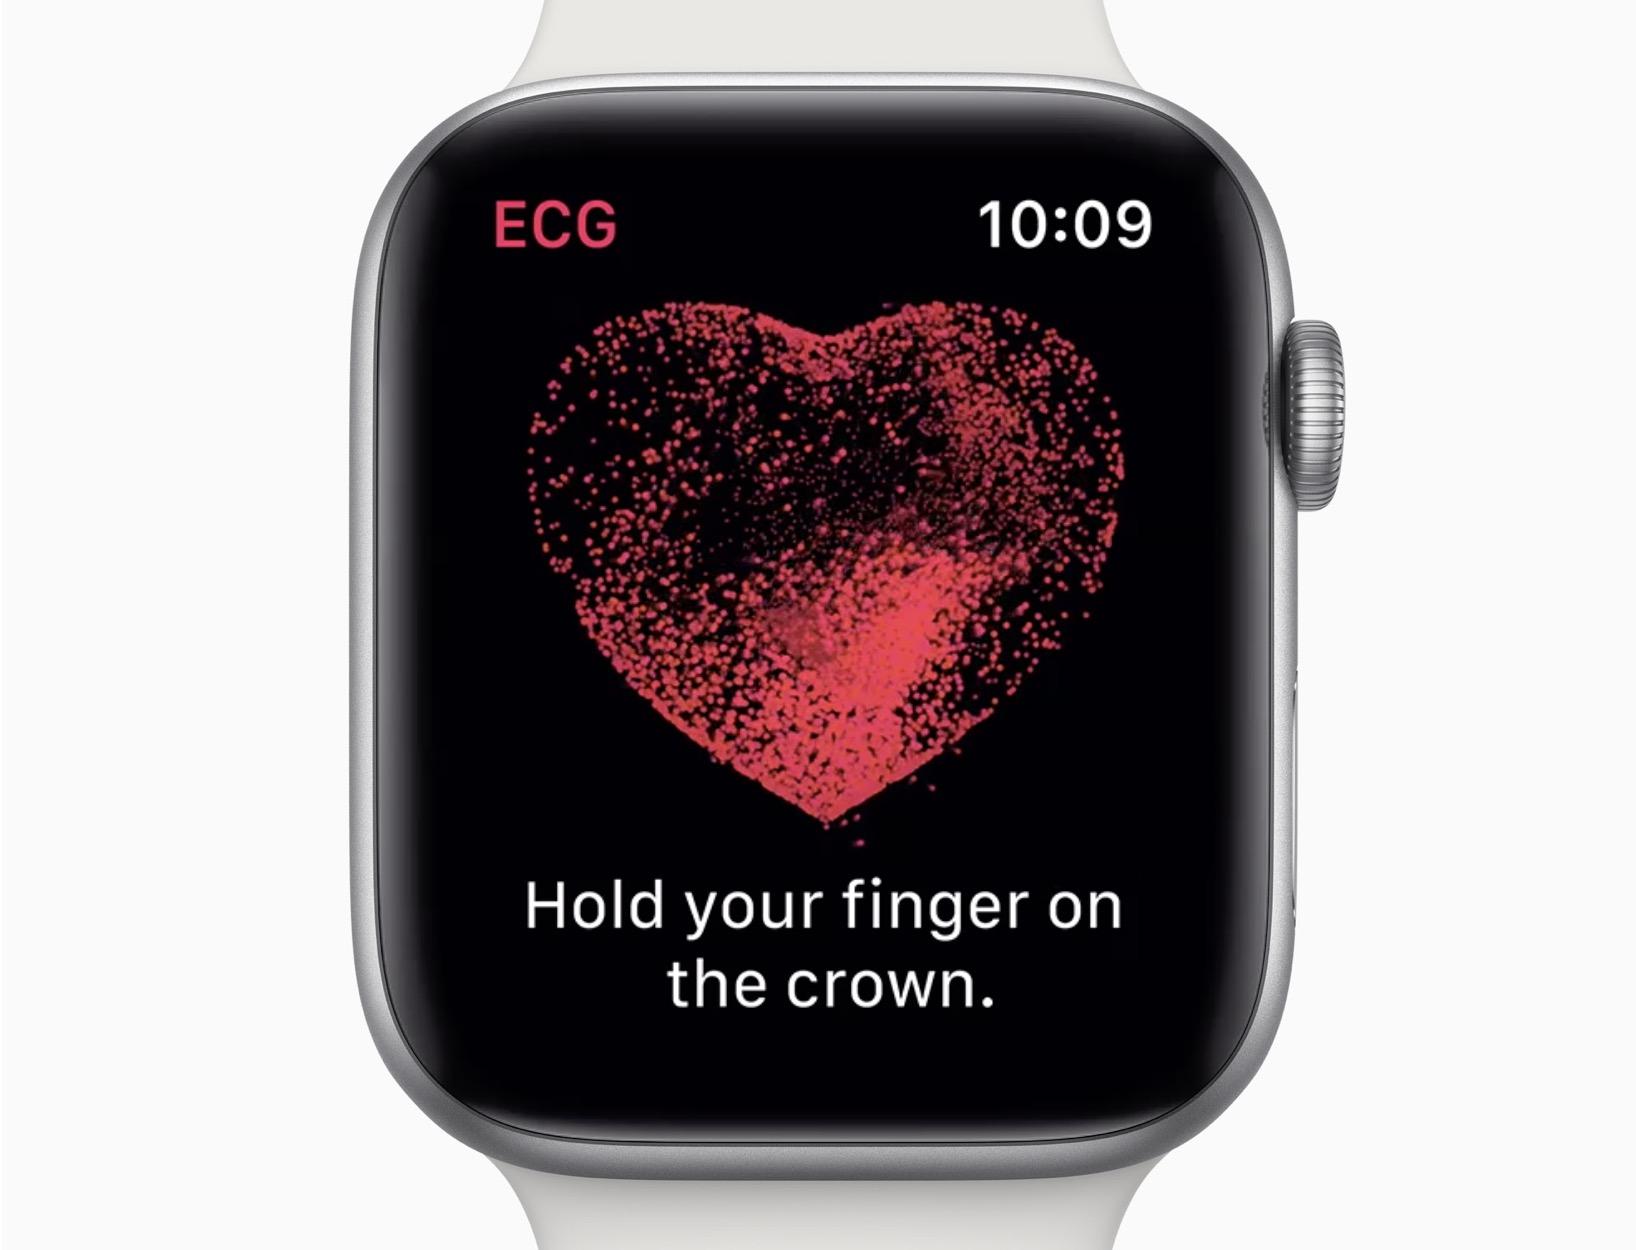 Apple prepares to release ECG app for Watch Series 4 | VentureBeat